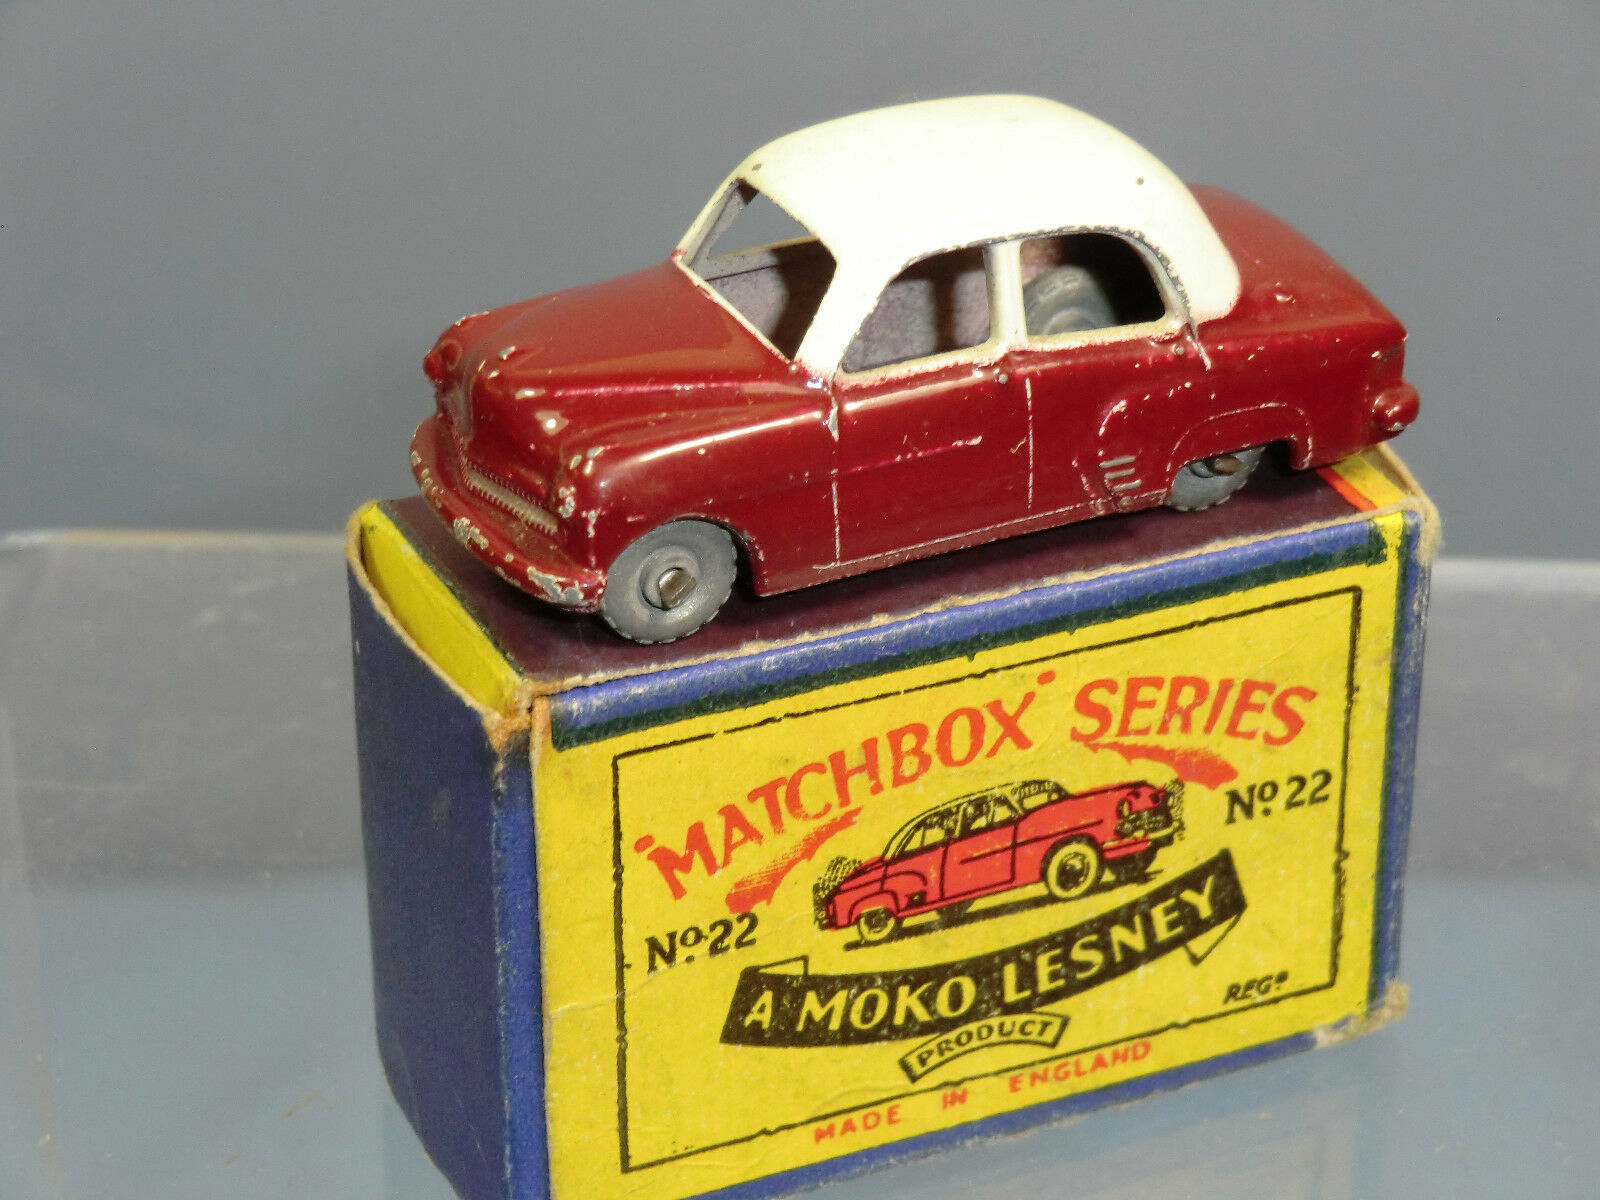 Matchbox moko lesney modell no.22a vauxhall cresta vn mib